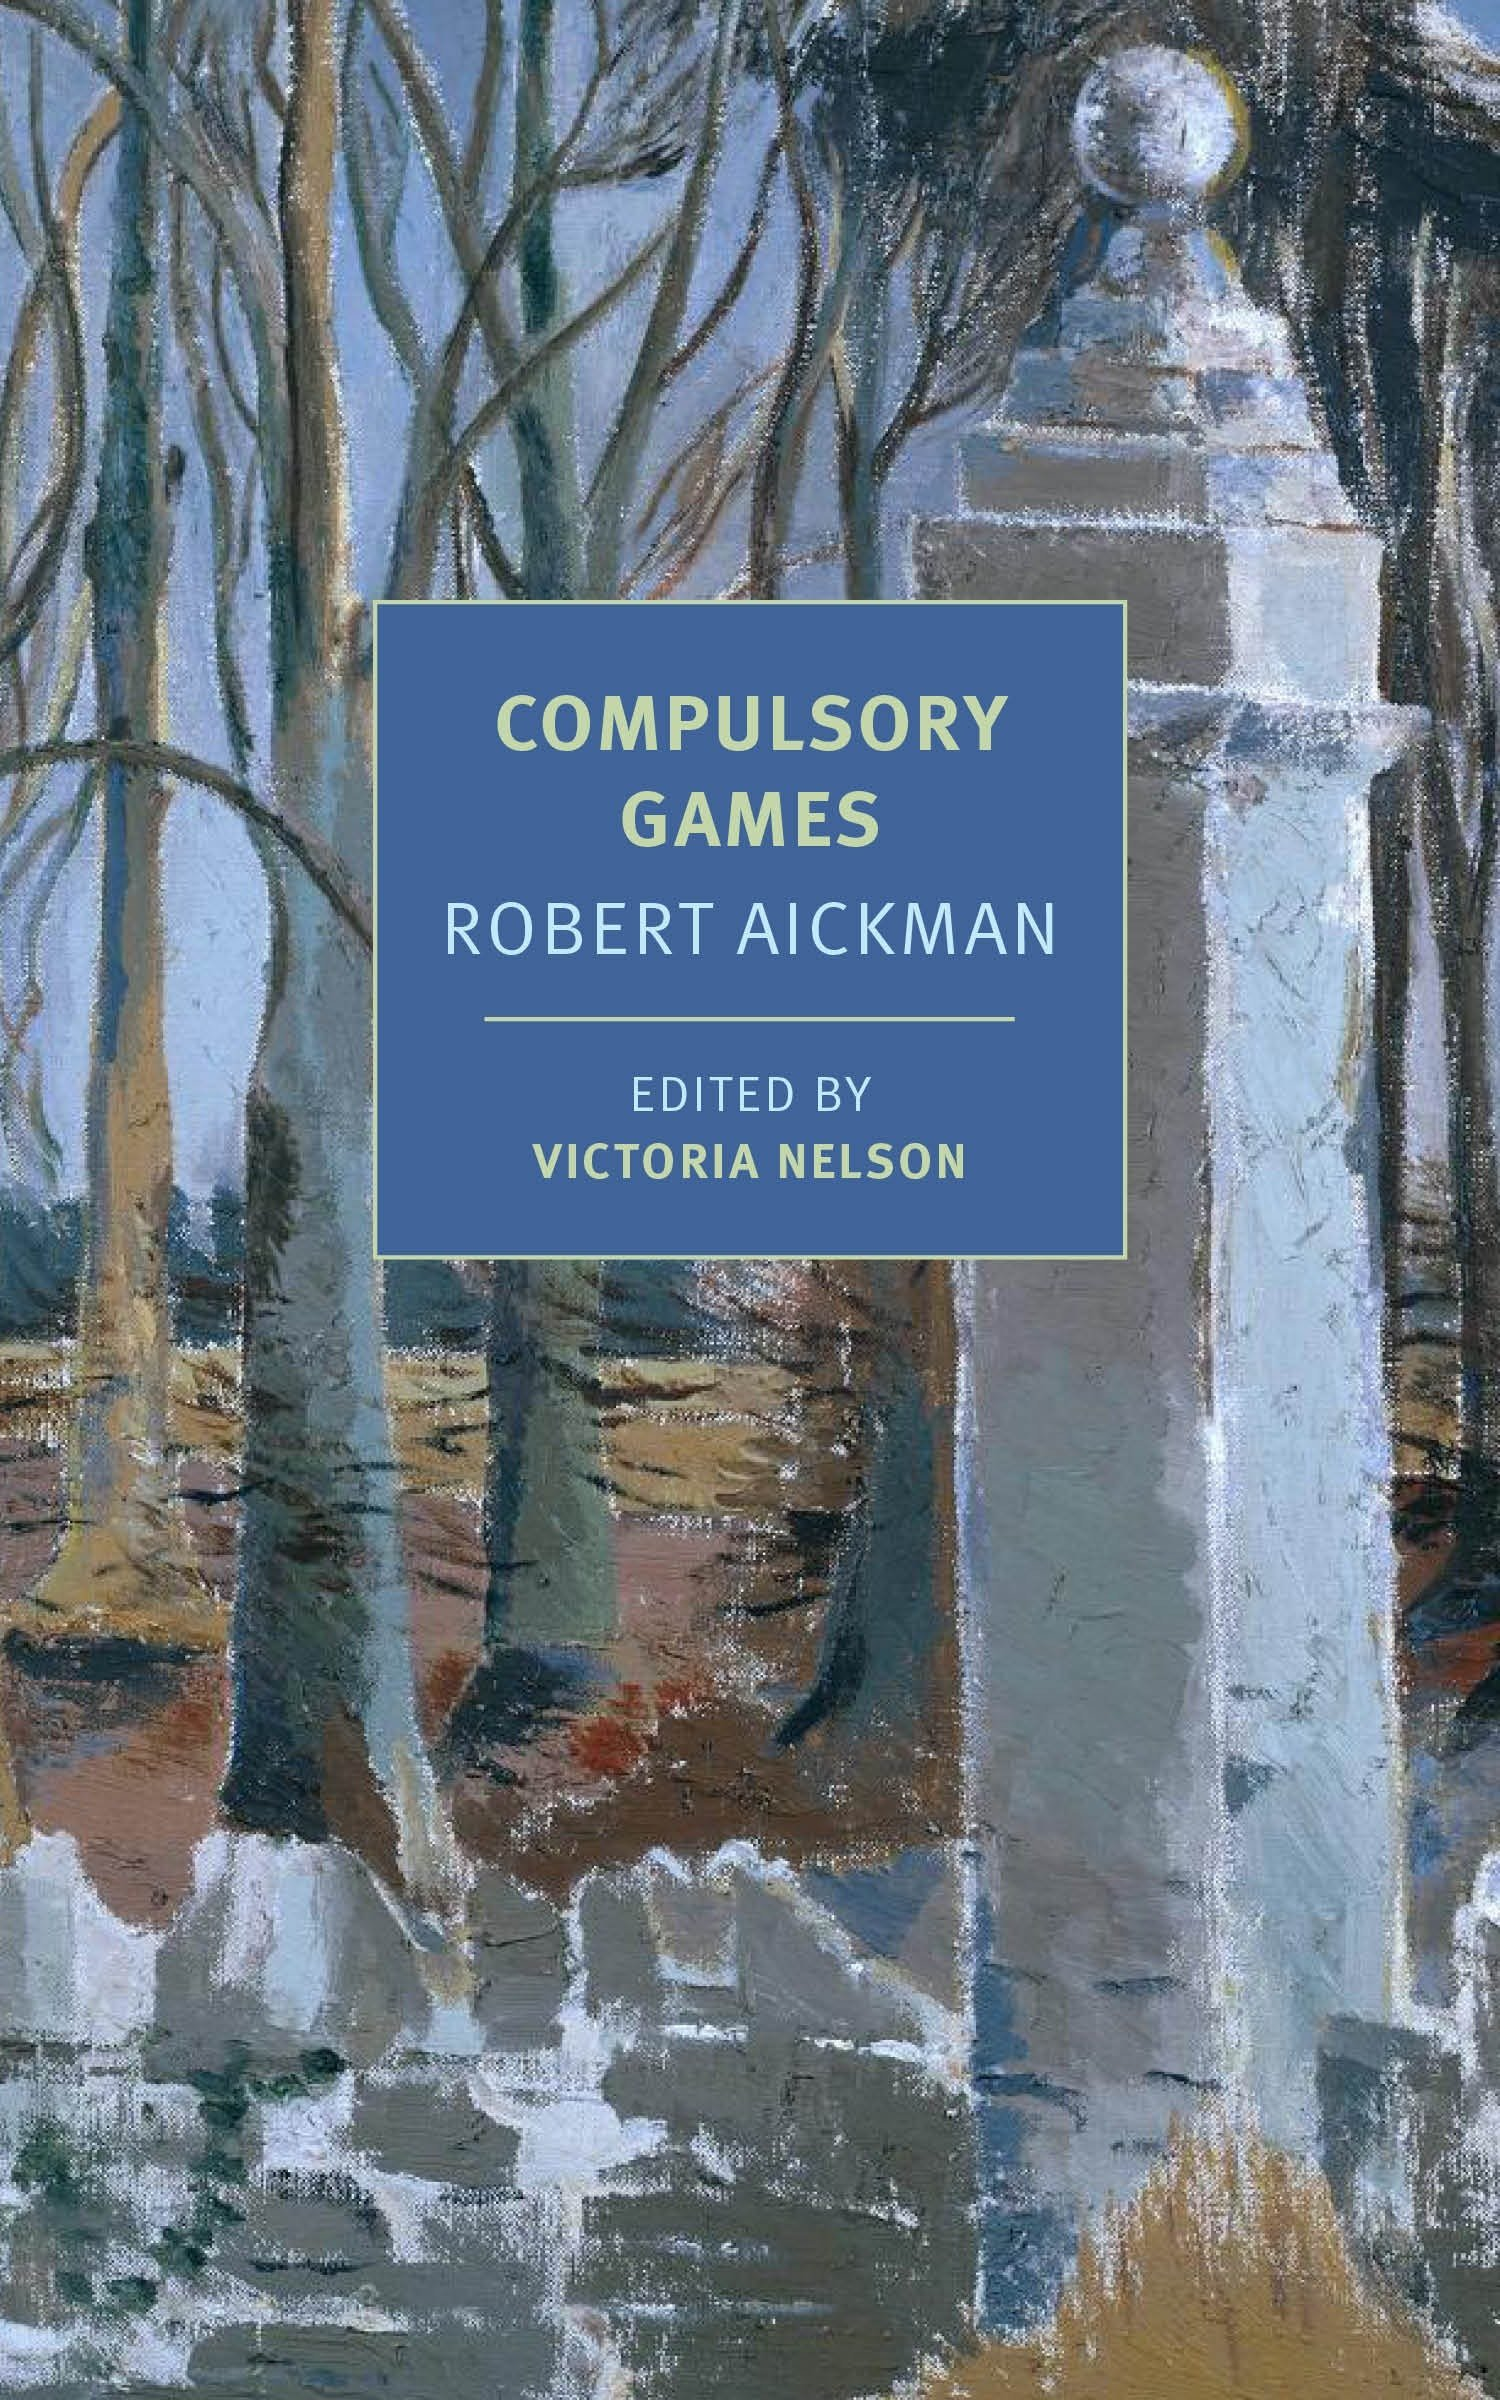 Compulsory Games (New York Review Books Classics) ebook